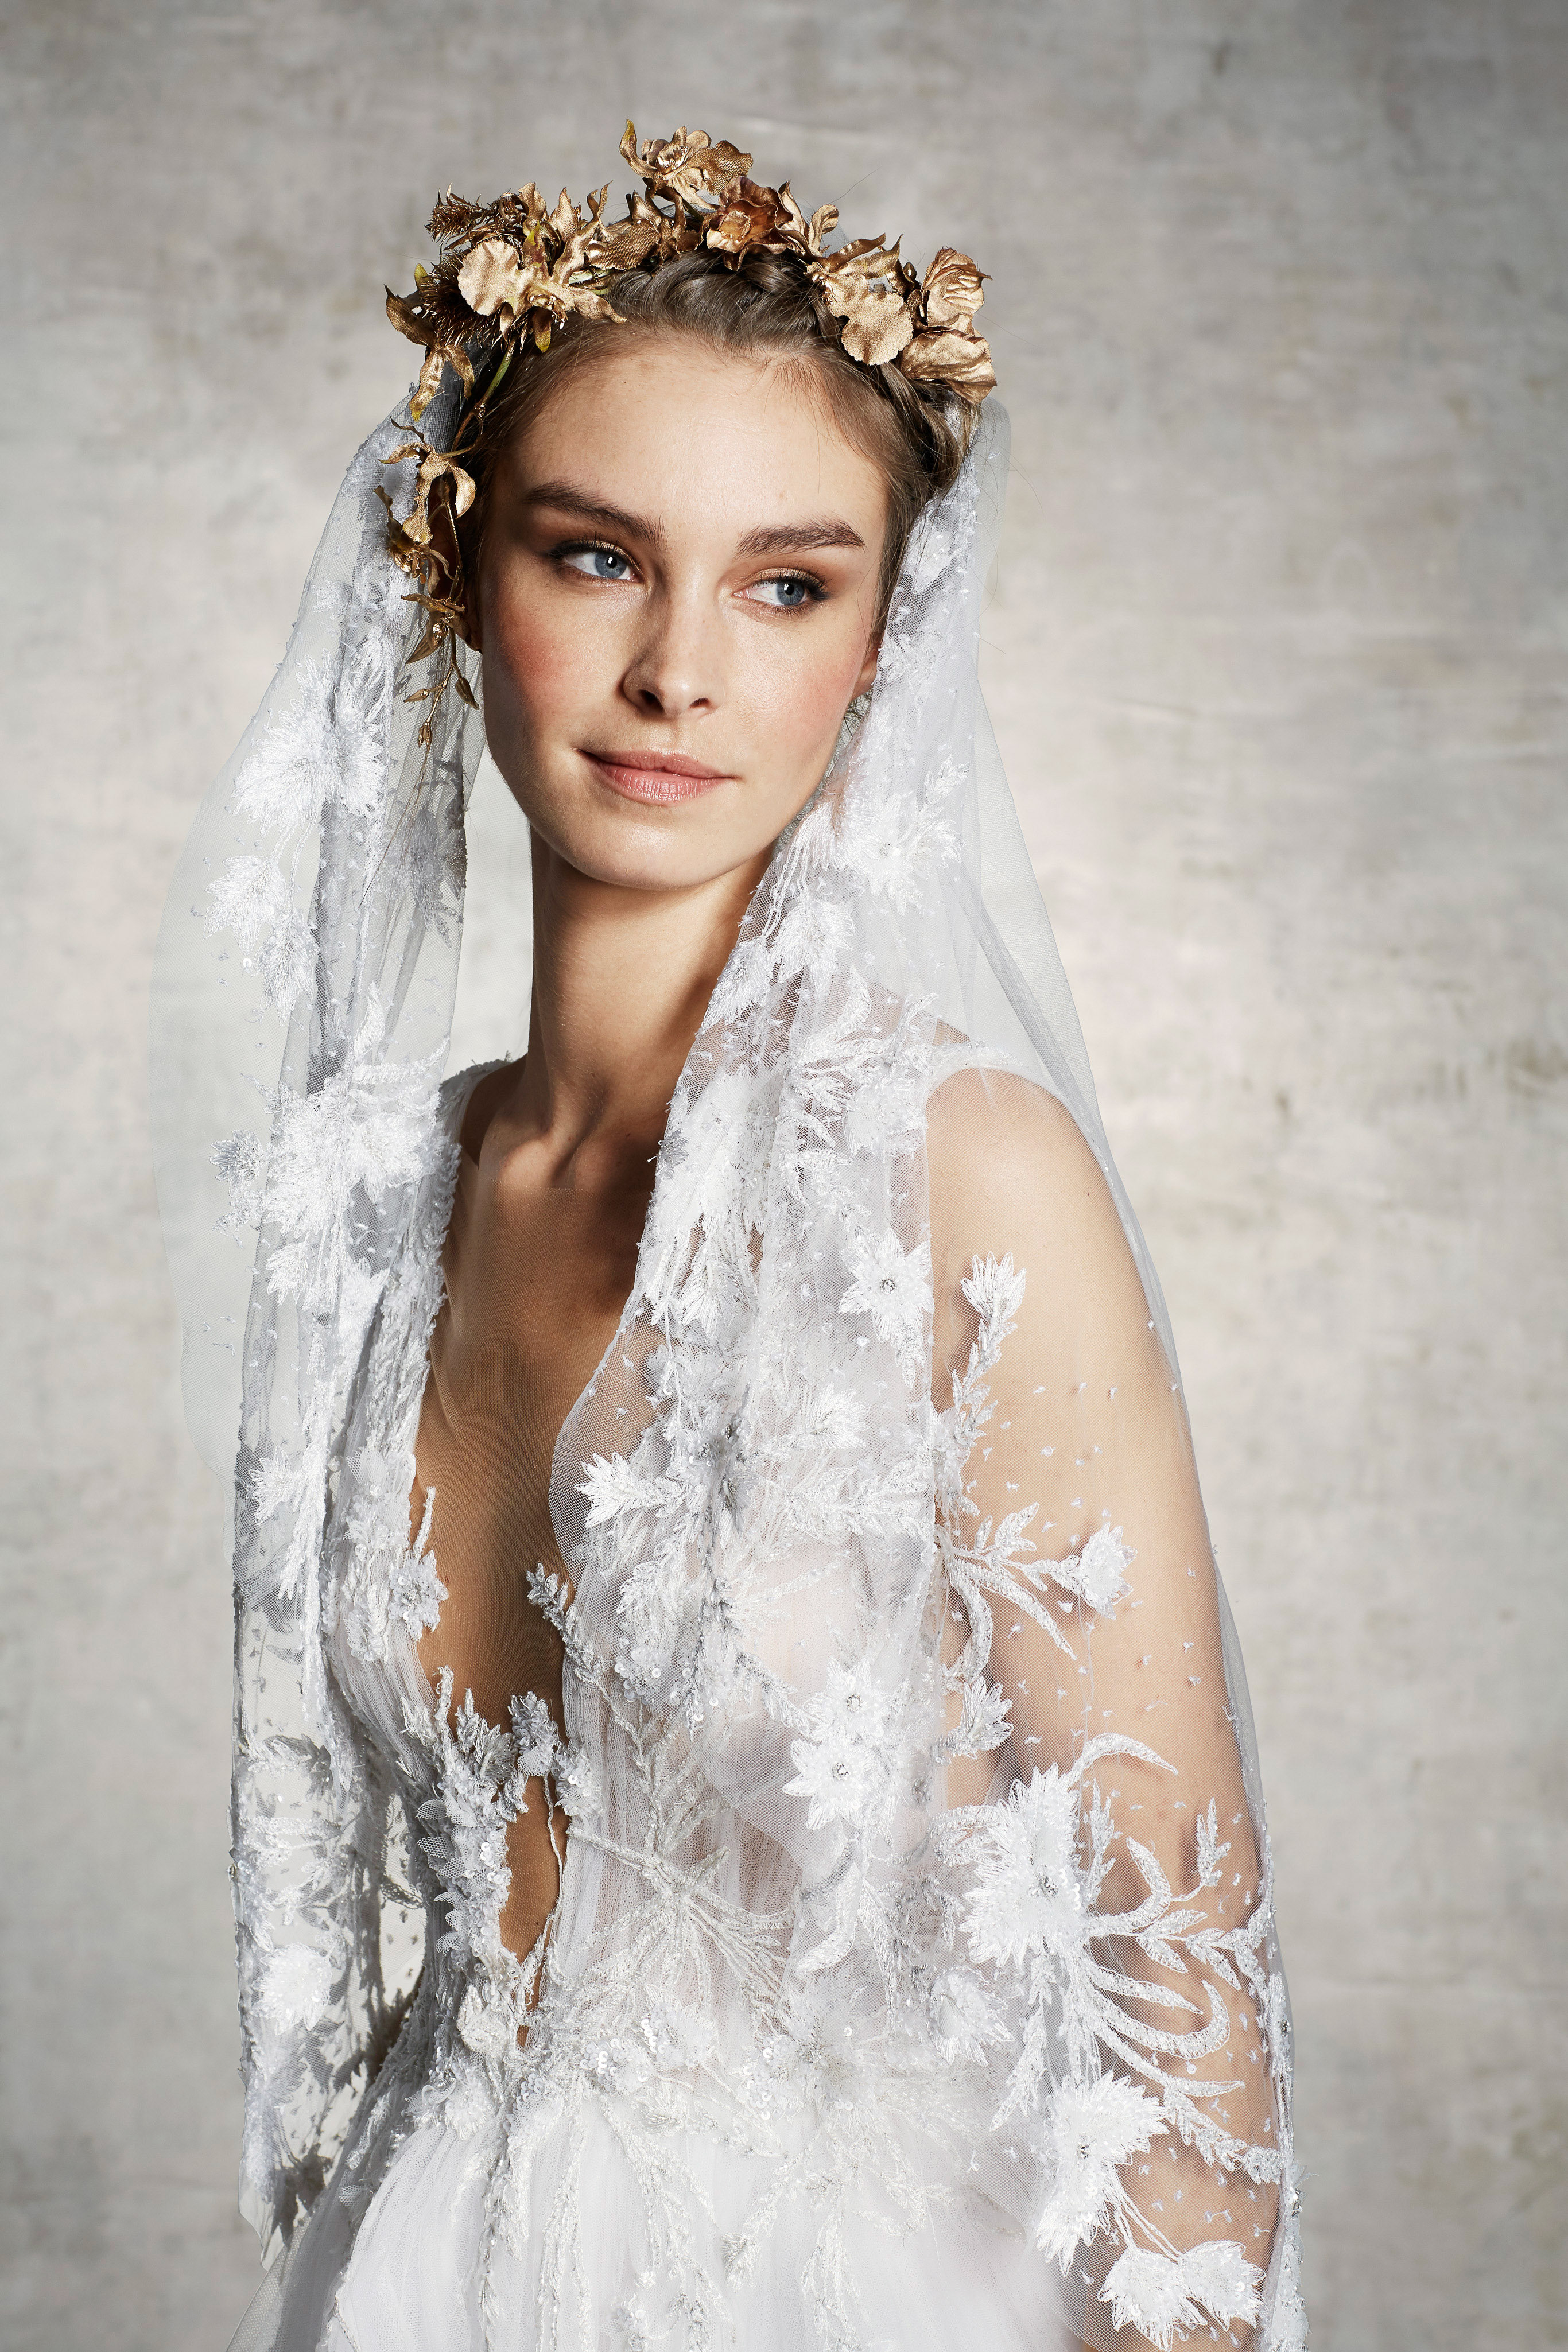 marchesa bridal wedding dress floral embroidery veil deep v